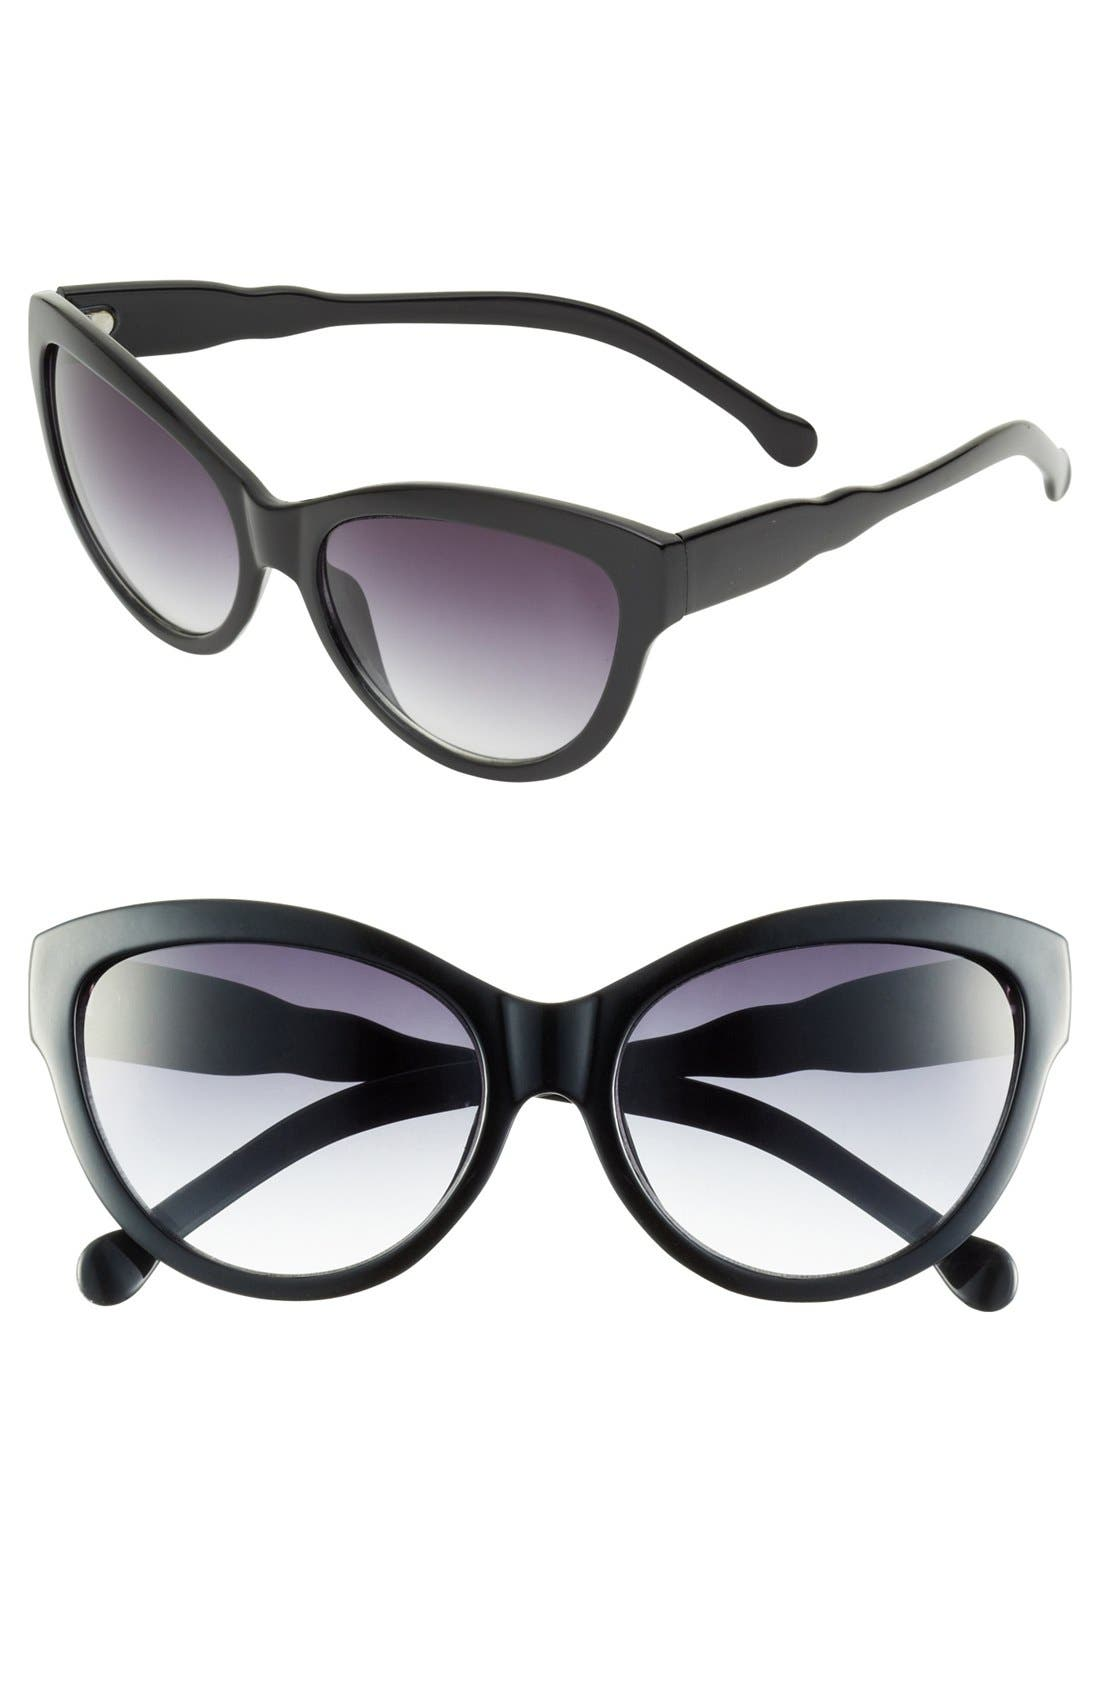 Alternate Image 1 Selected - Outlook Eyewear Sunglasses